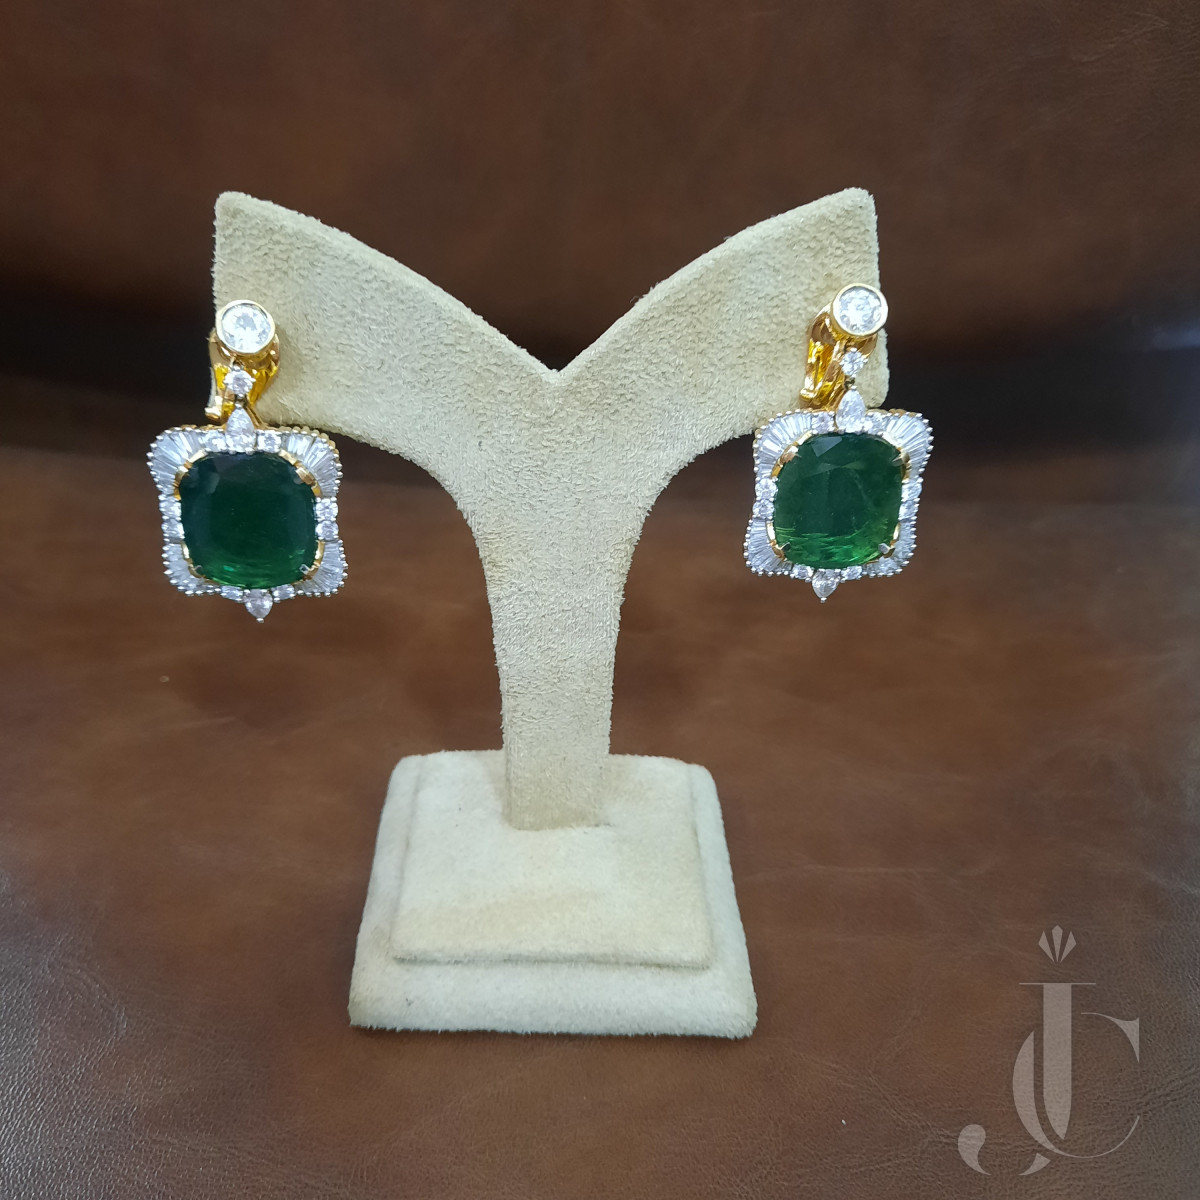 Natural Zambian Emerald Cushion Oval Pair Earings with Diamonds